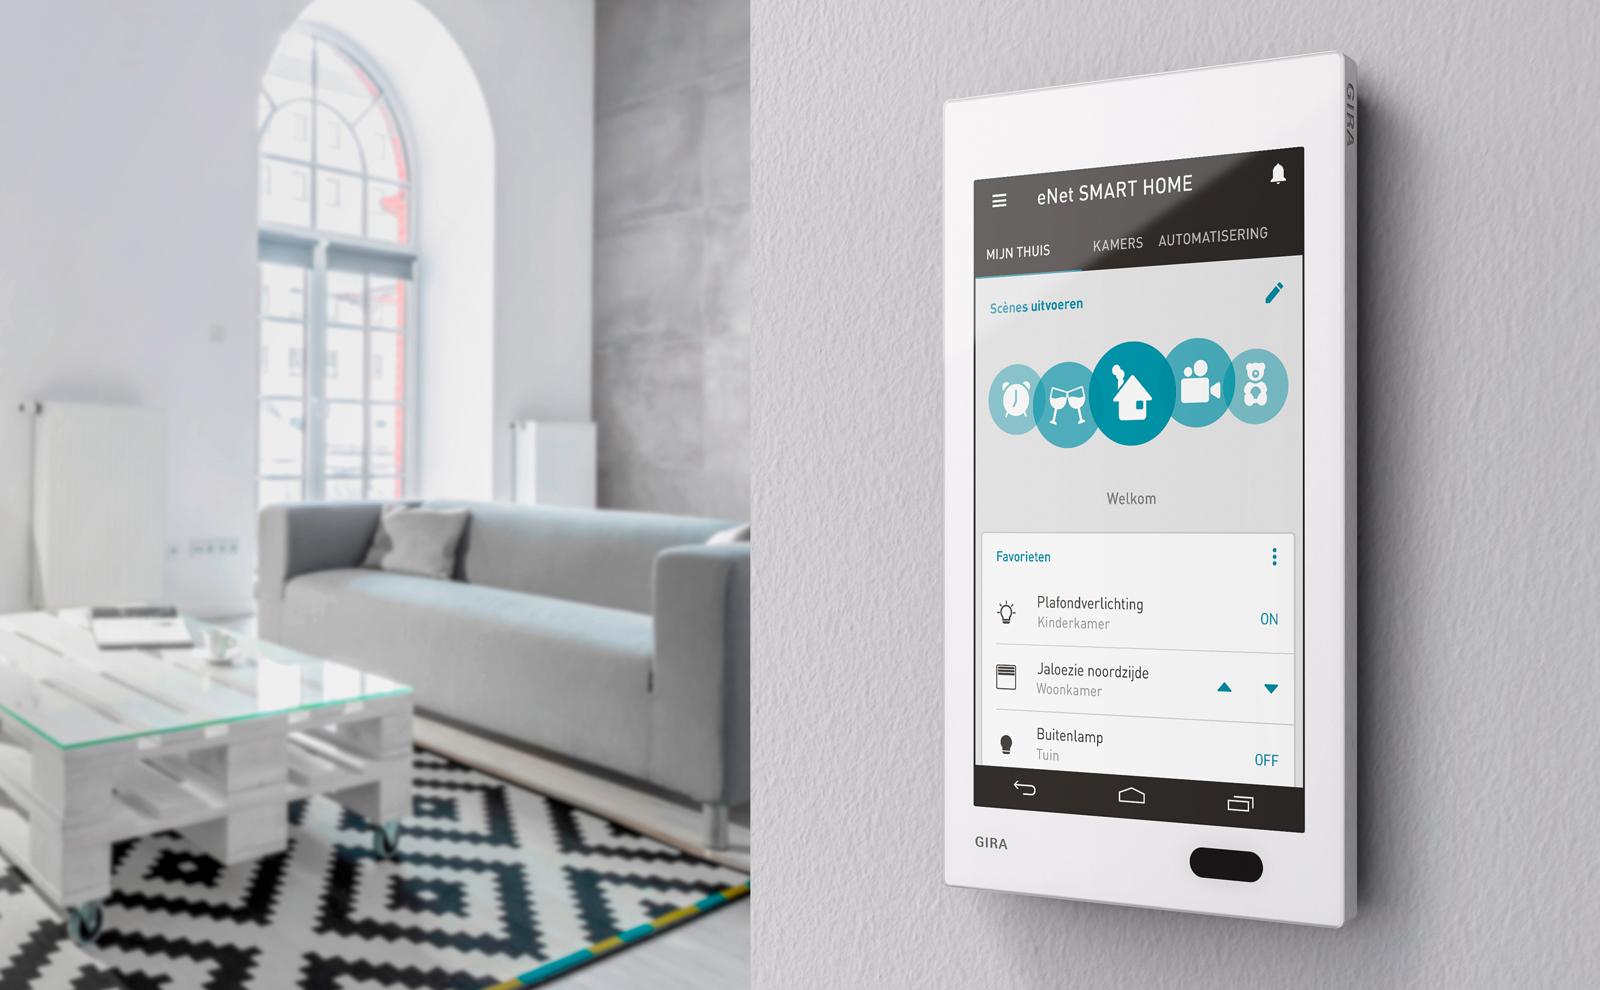 Gira G1 met eNet interface in de woonkamer